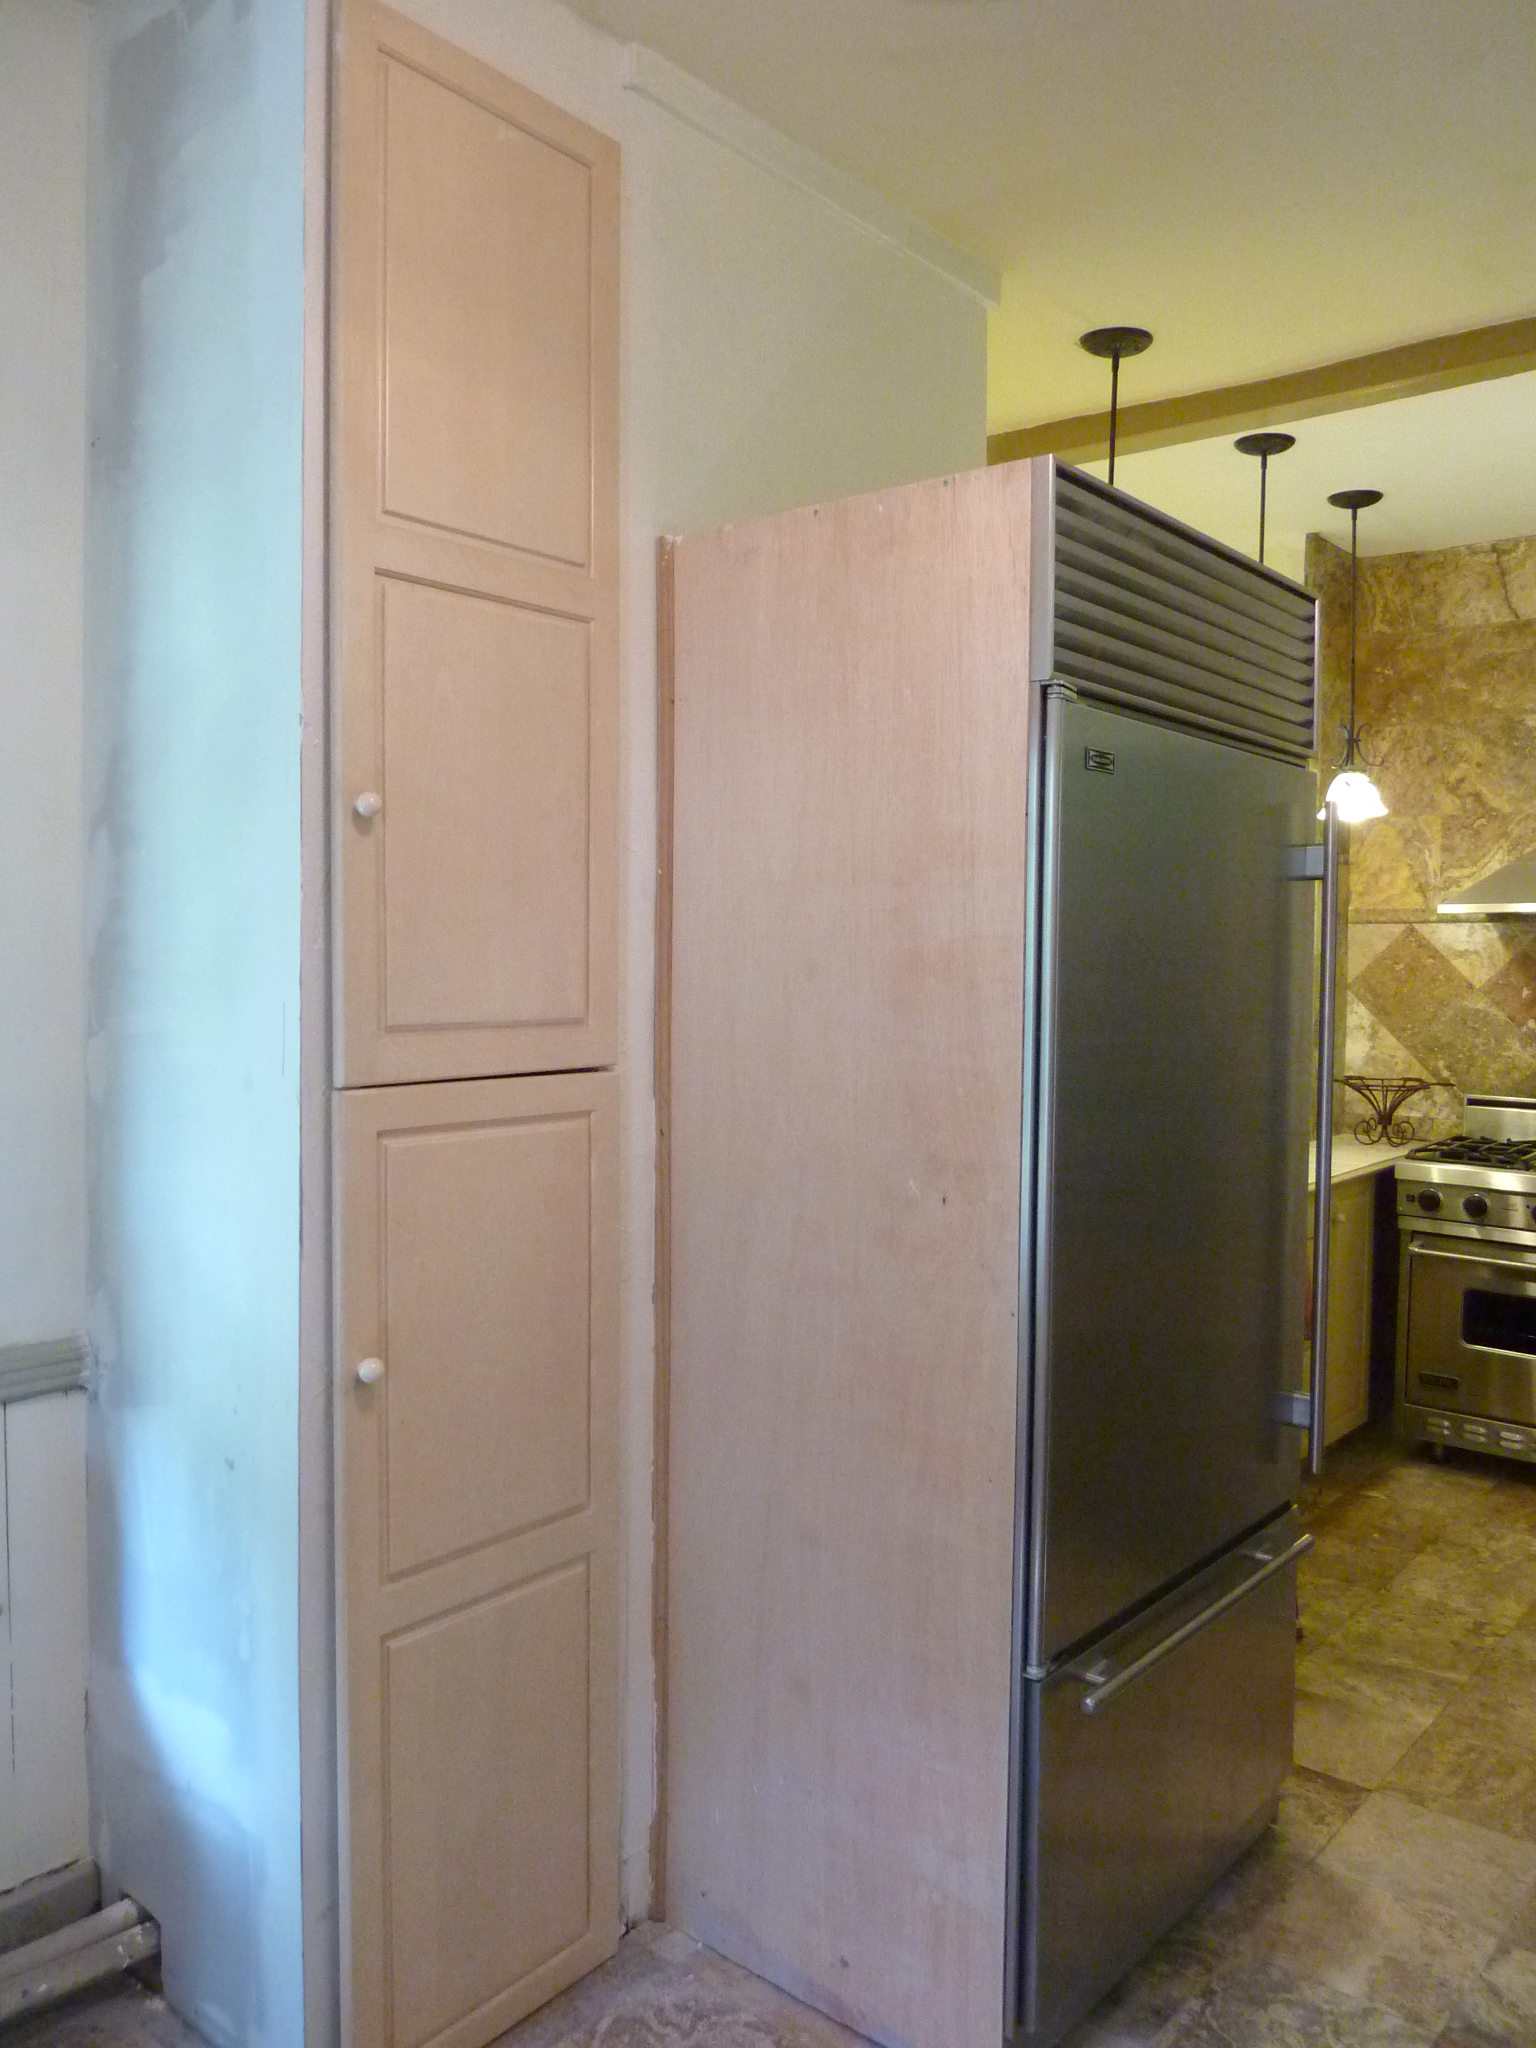 Cabinet doors were reconfigured to build a floor-to-ceiling cabinet.